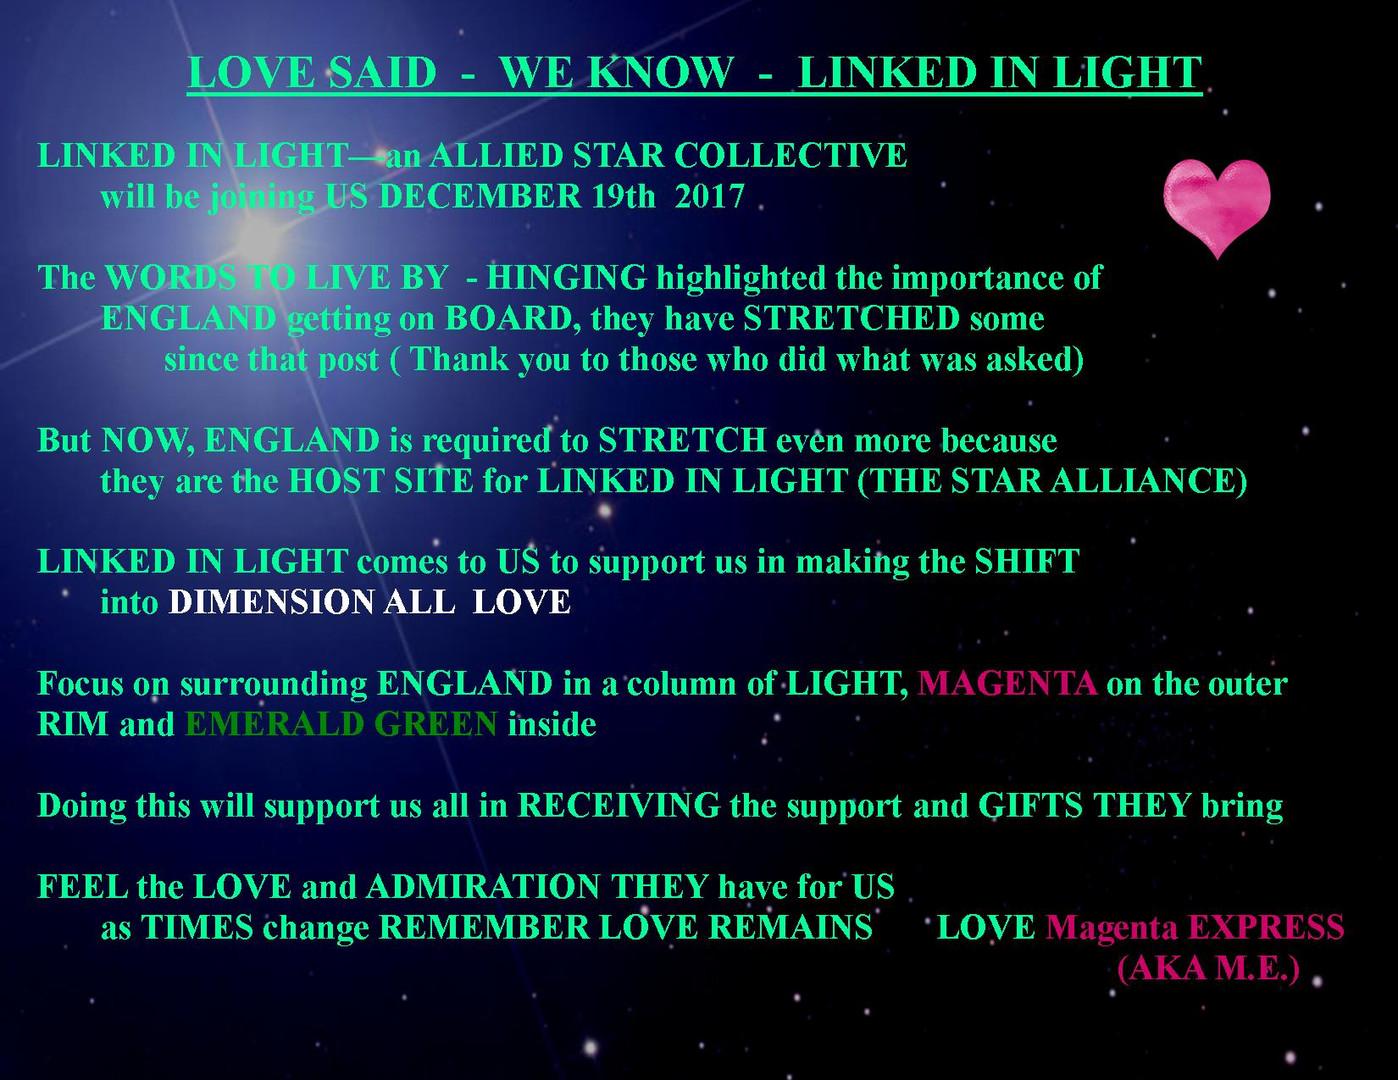 LOVE SAID LINKED IN LIGHT PEG.jpg